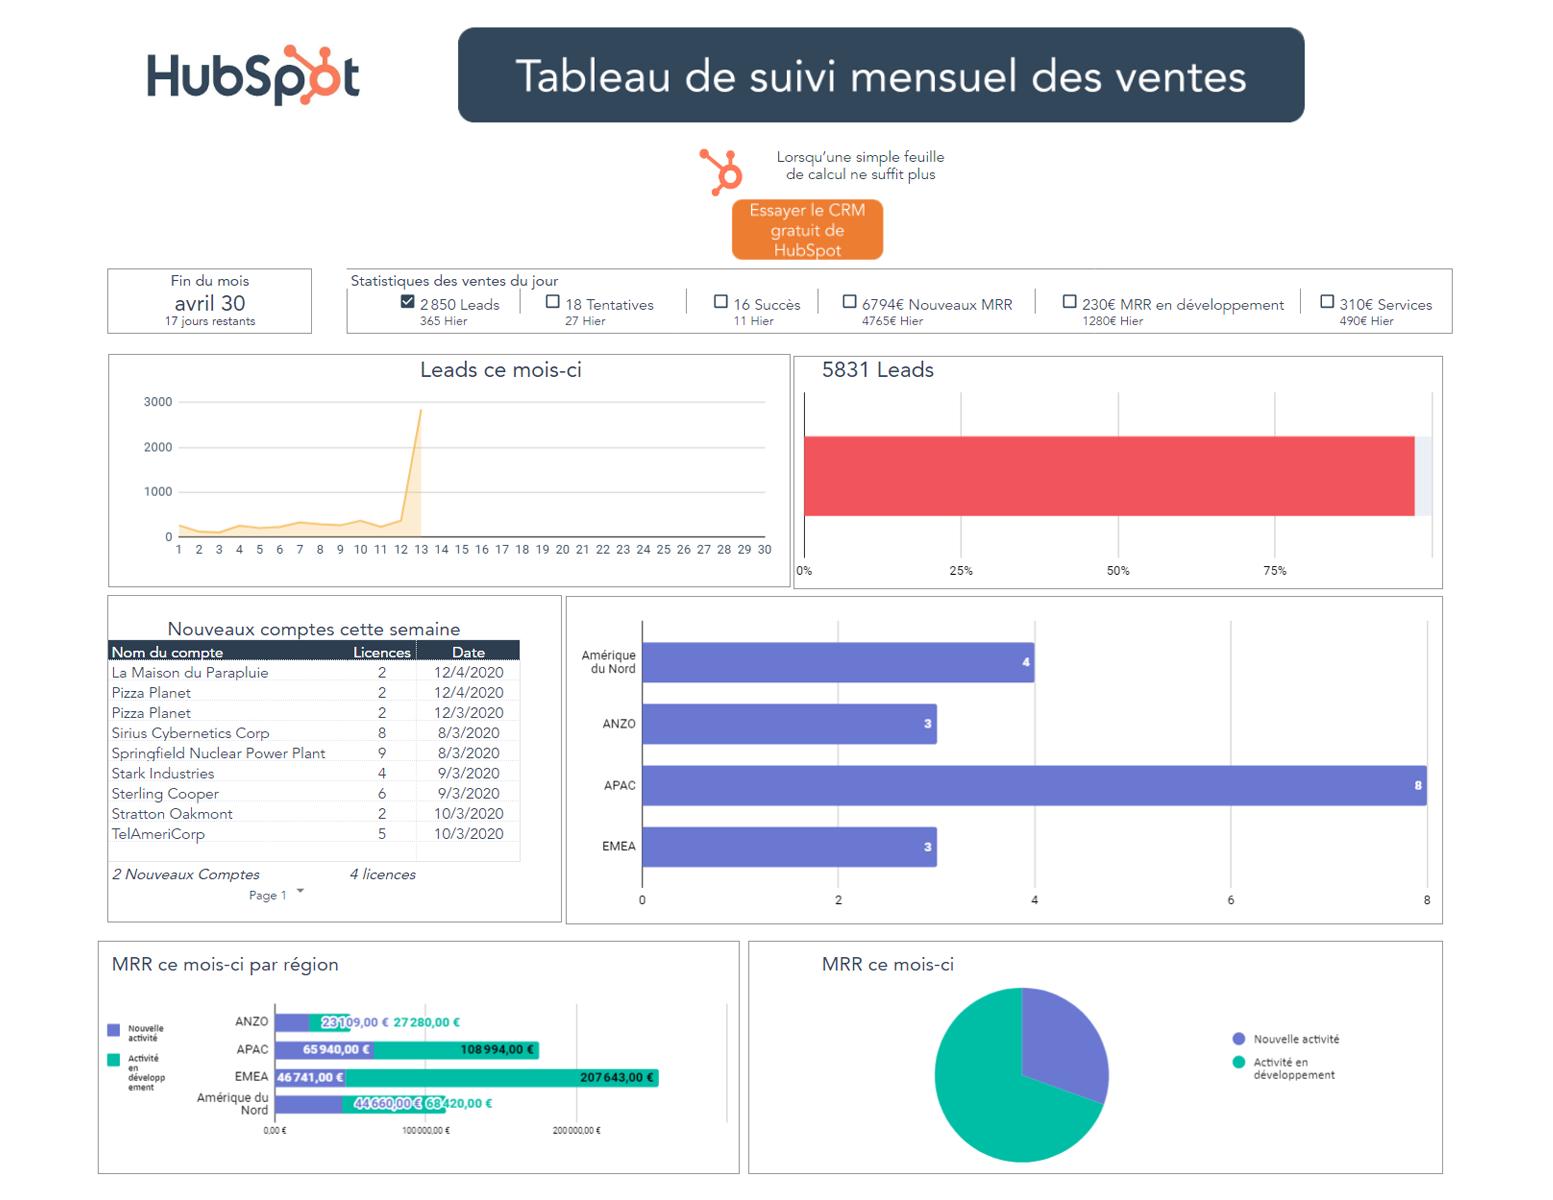 14 Modeles Et Exemples Gratuits Excel Hubspot